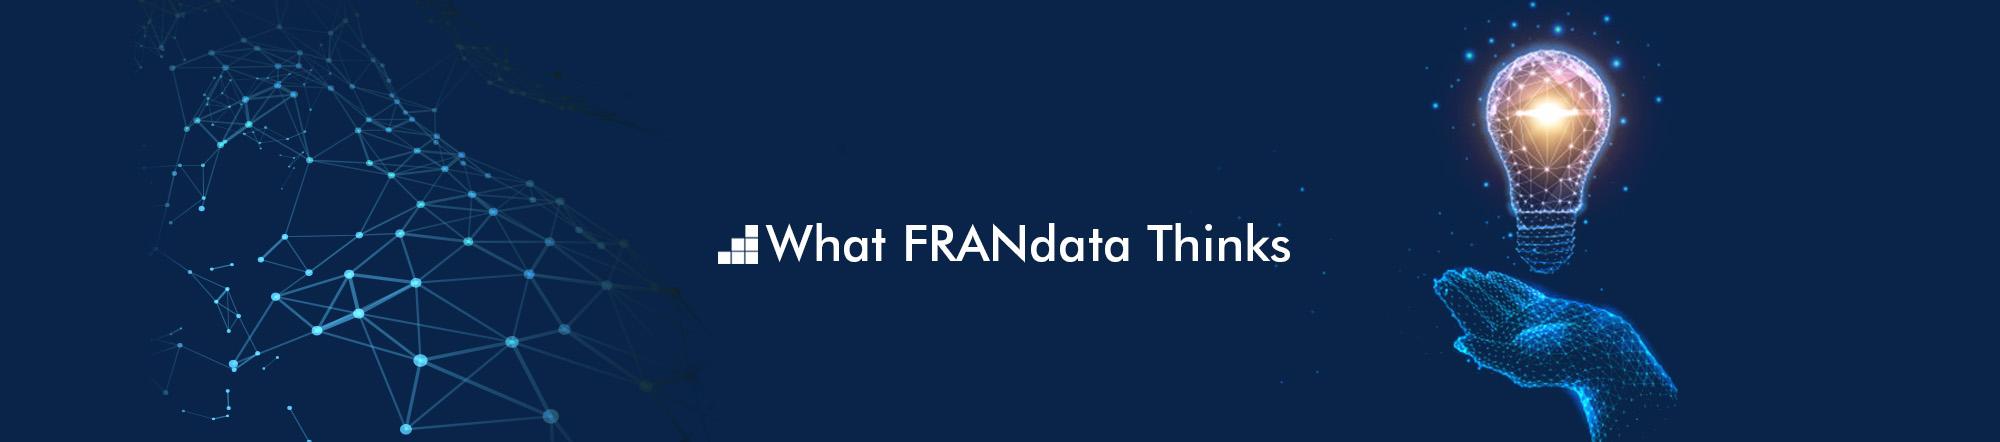 What FRANdata Thinks